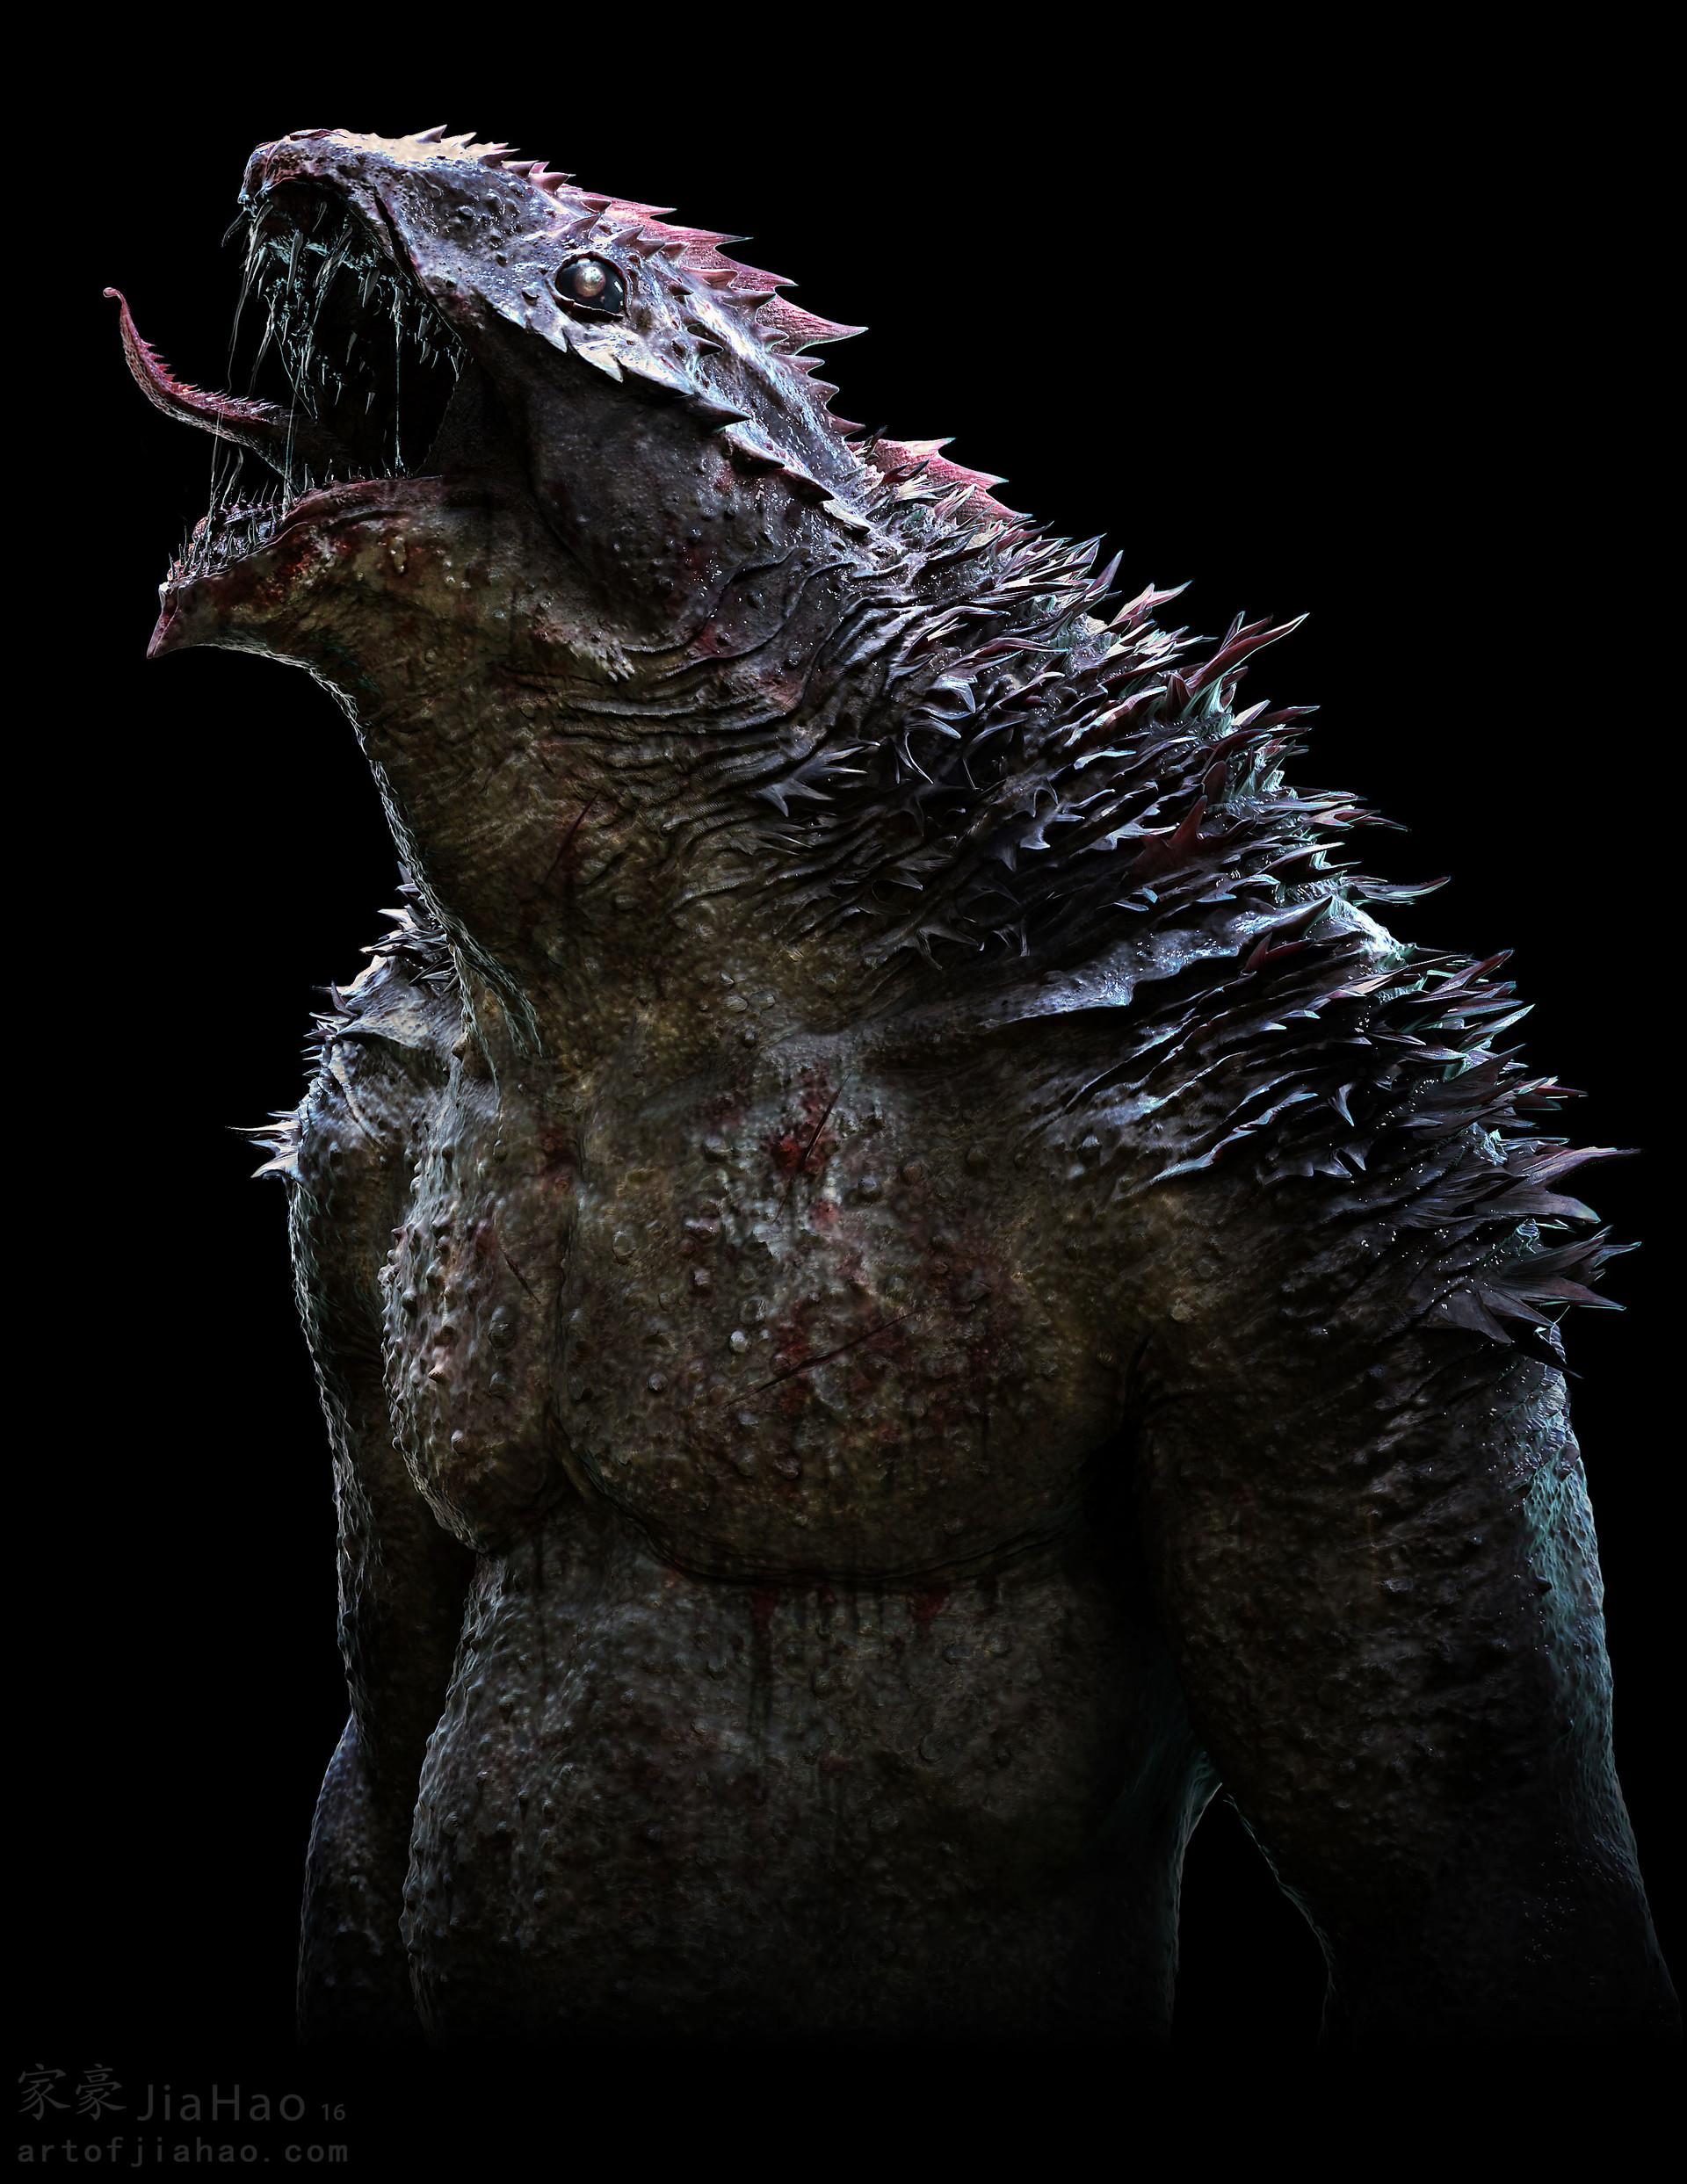 Jia hao 2016 02 abysslurker comp creaturefocus